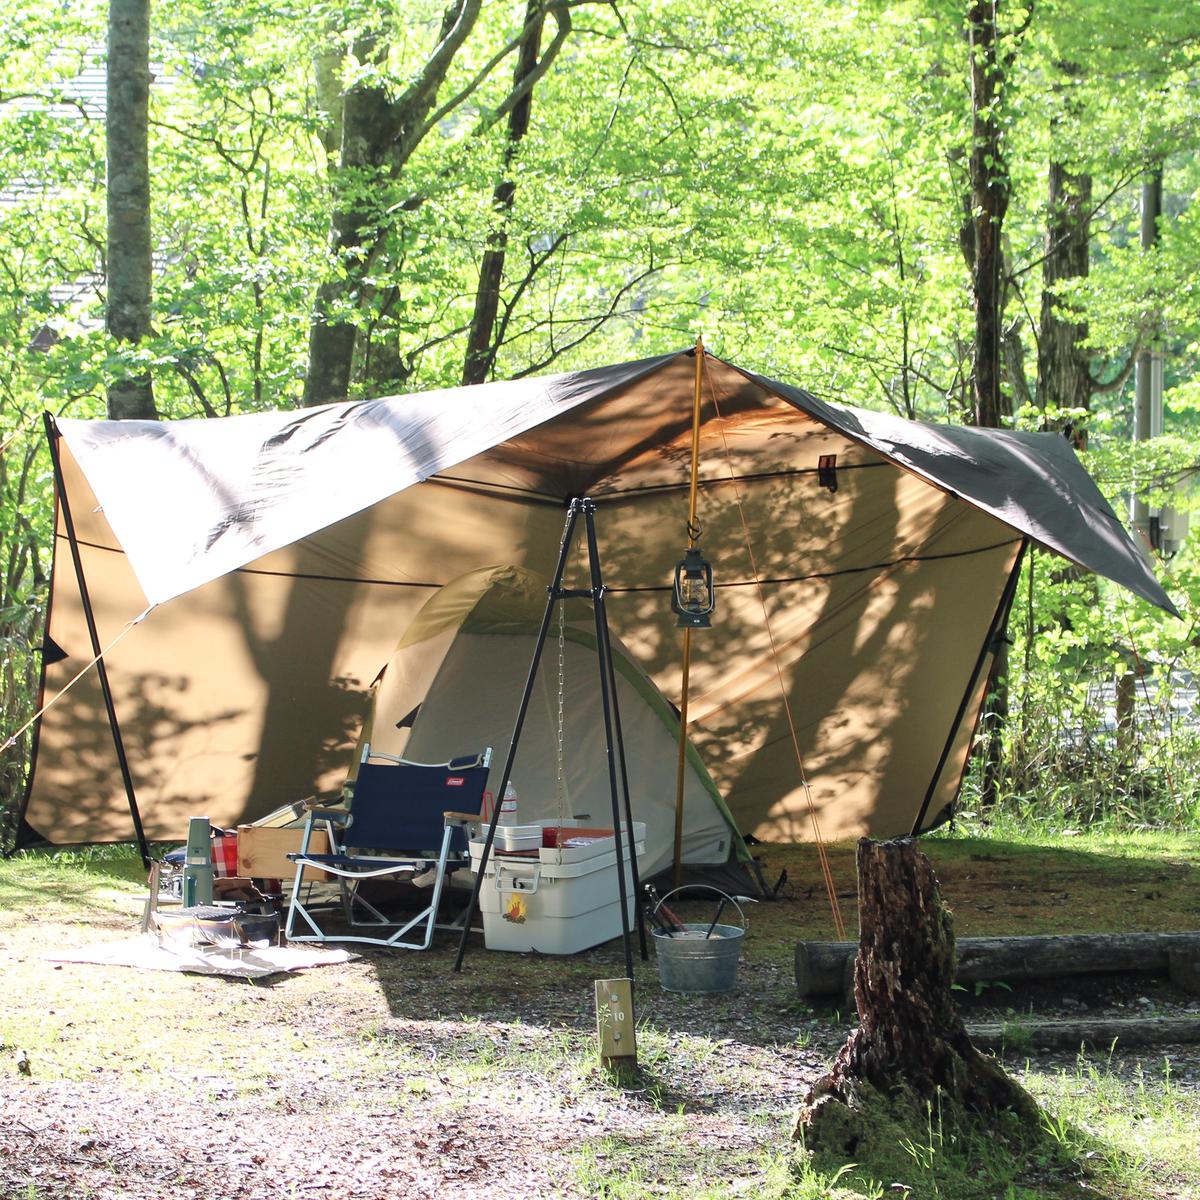 f:id:in-n-outdoor:20210527175302j:plain